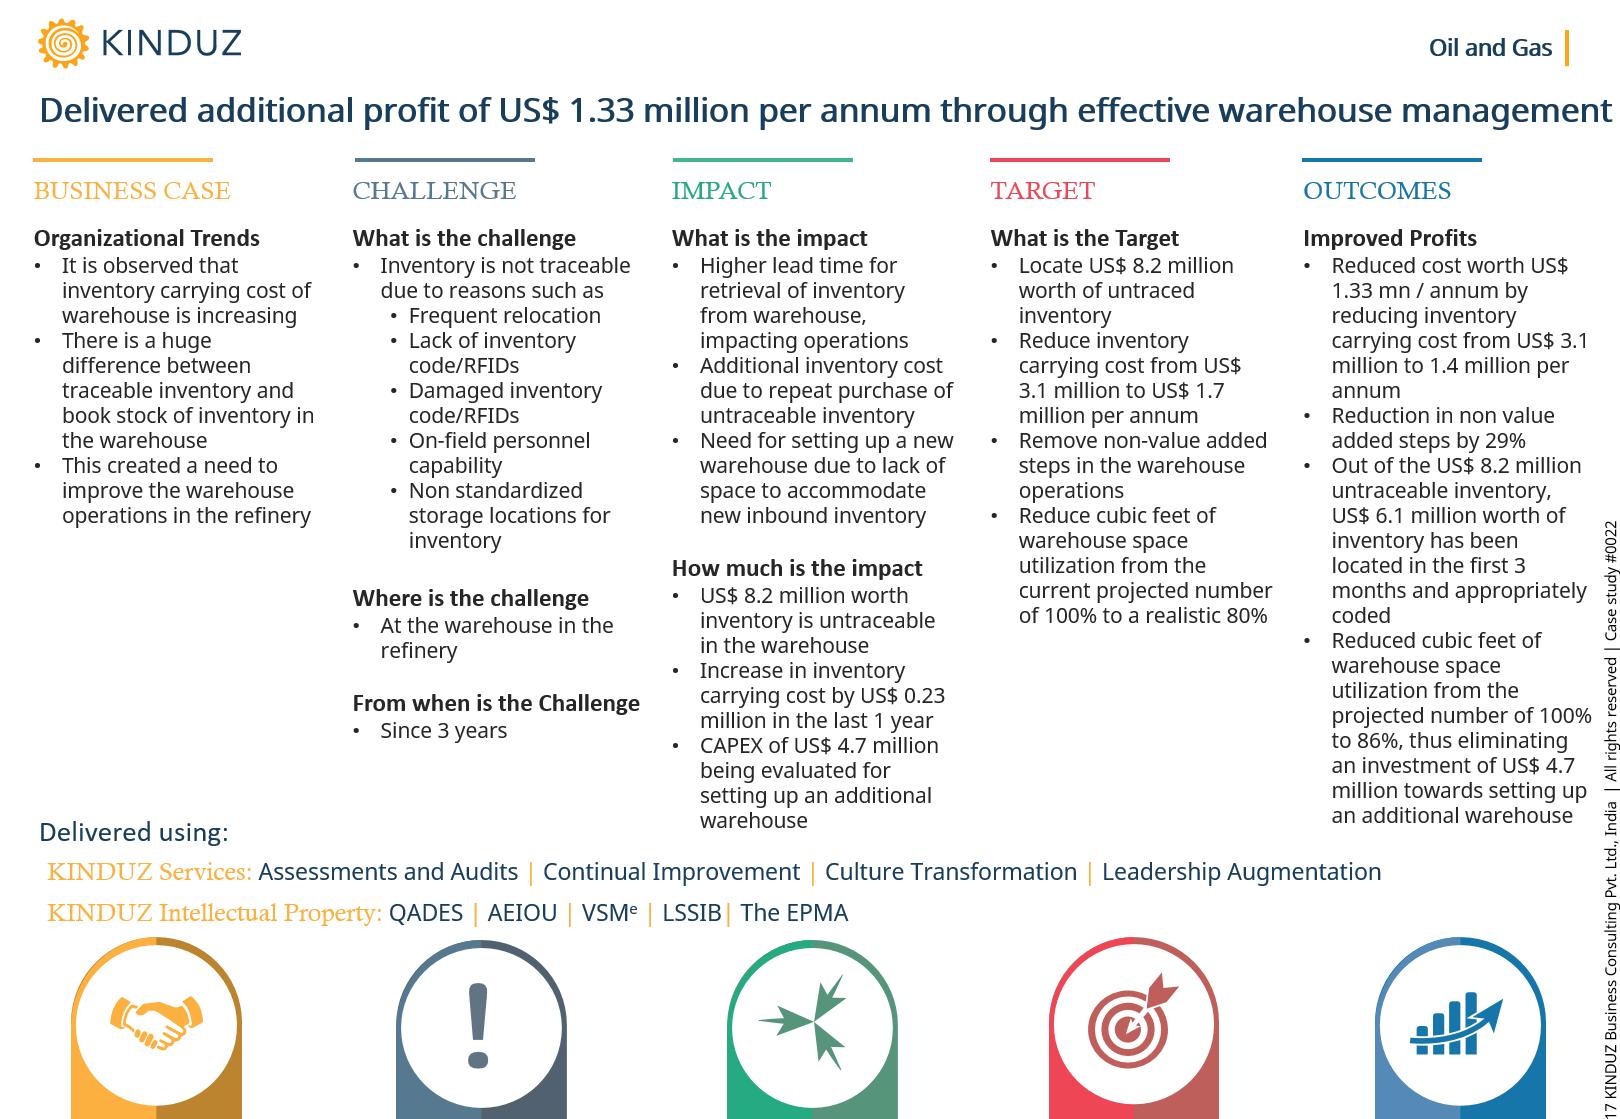 delivered-additional-profit-of-us-1.33-million-per-annum-through-effective-warehouse-management